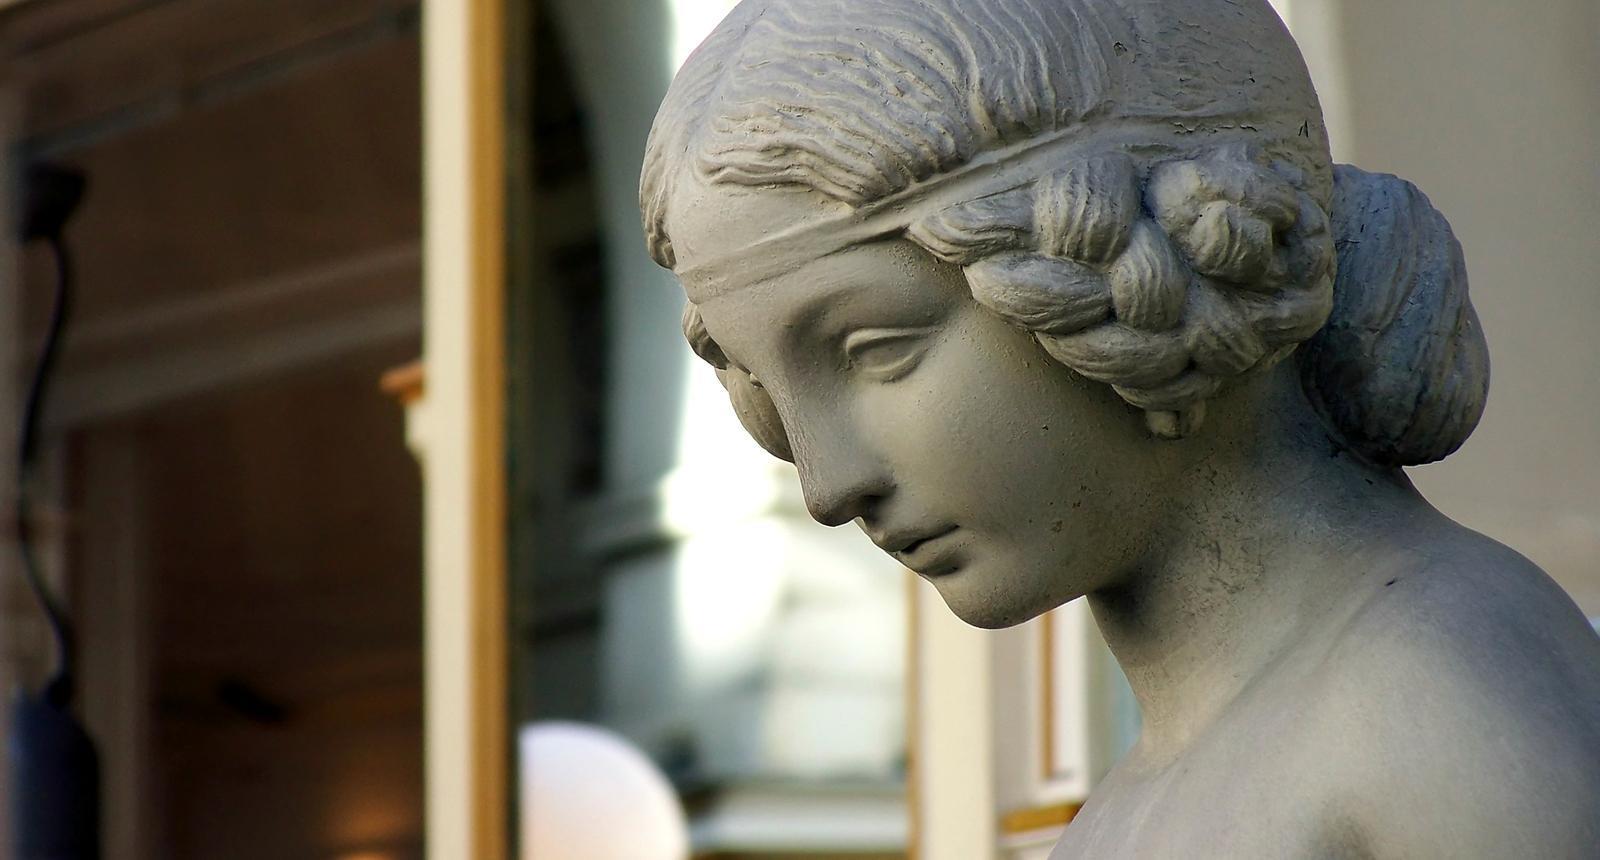 Statue Passage Pommeraye, Nantes